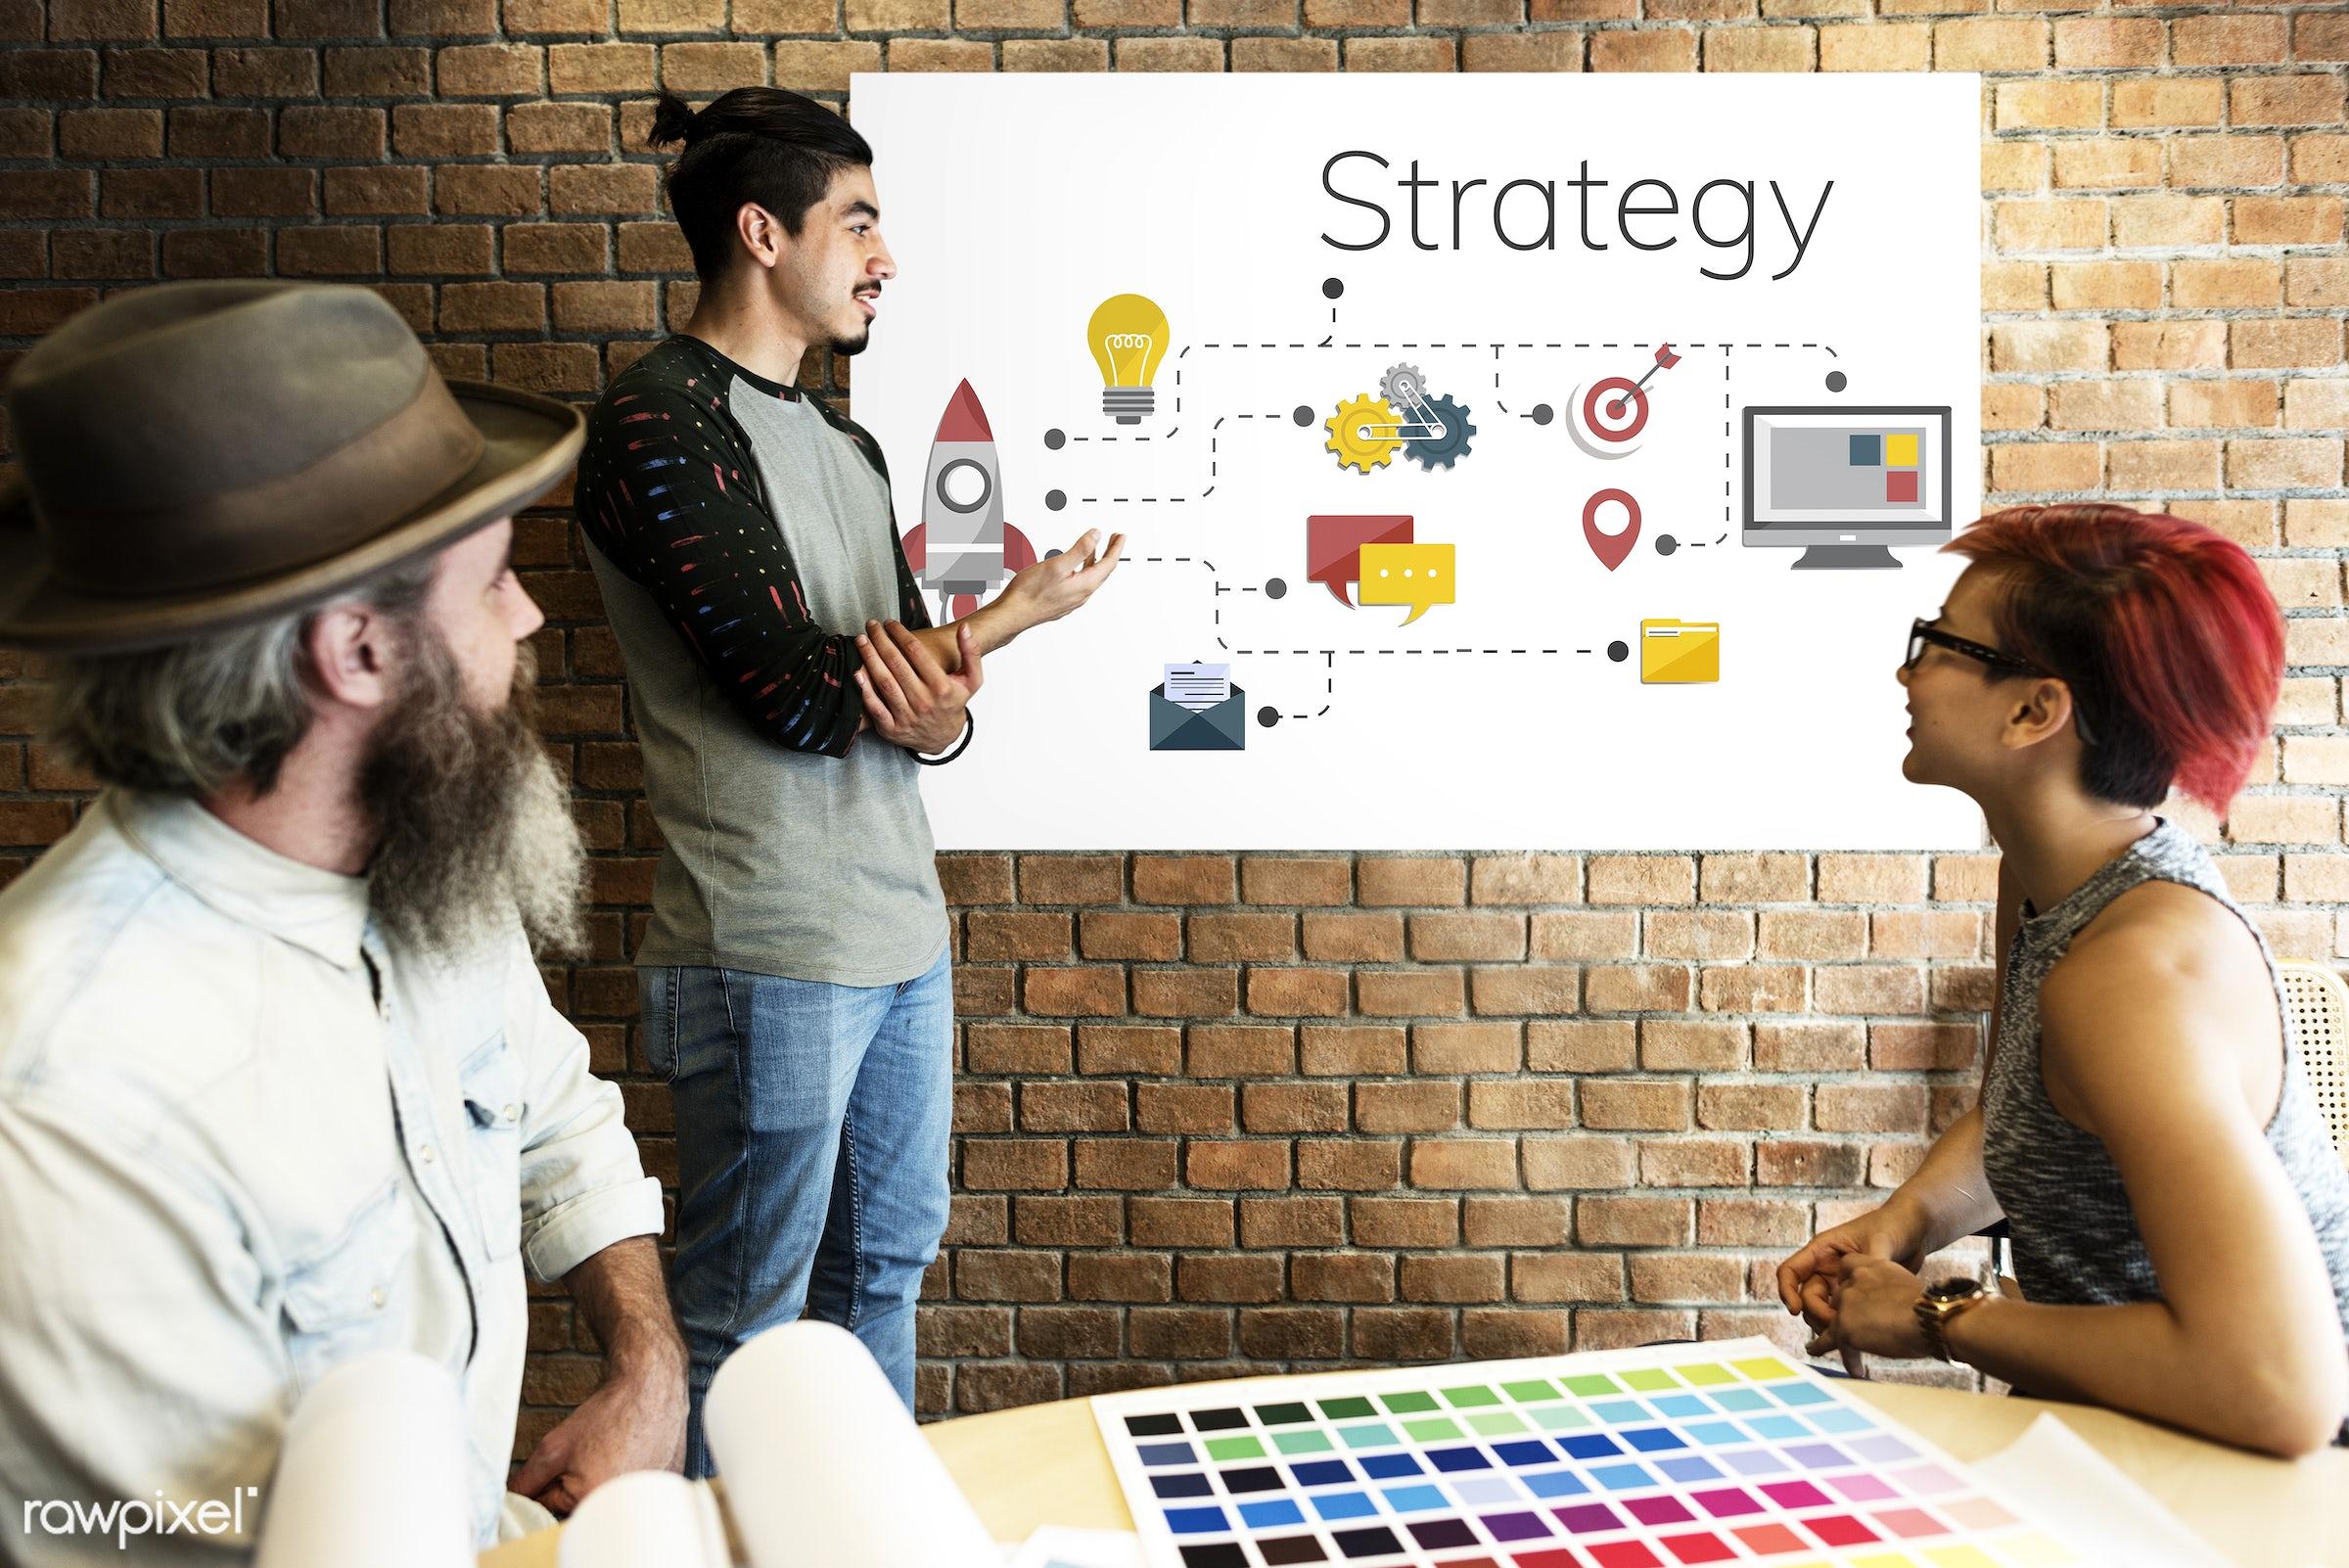 art, beard, board, brick wall, business, capital, chart, cloud, color chart, colors, communication, concept, creative, data...